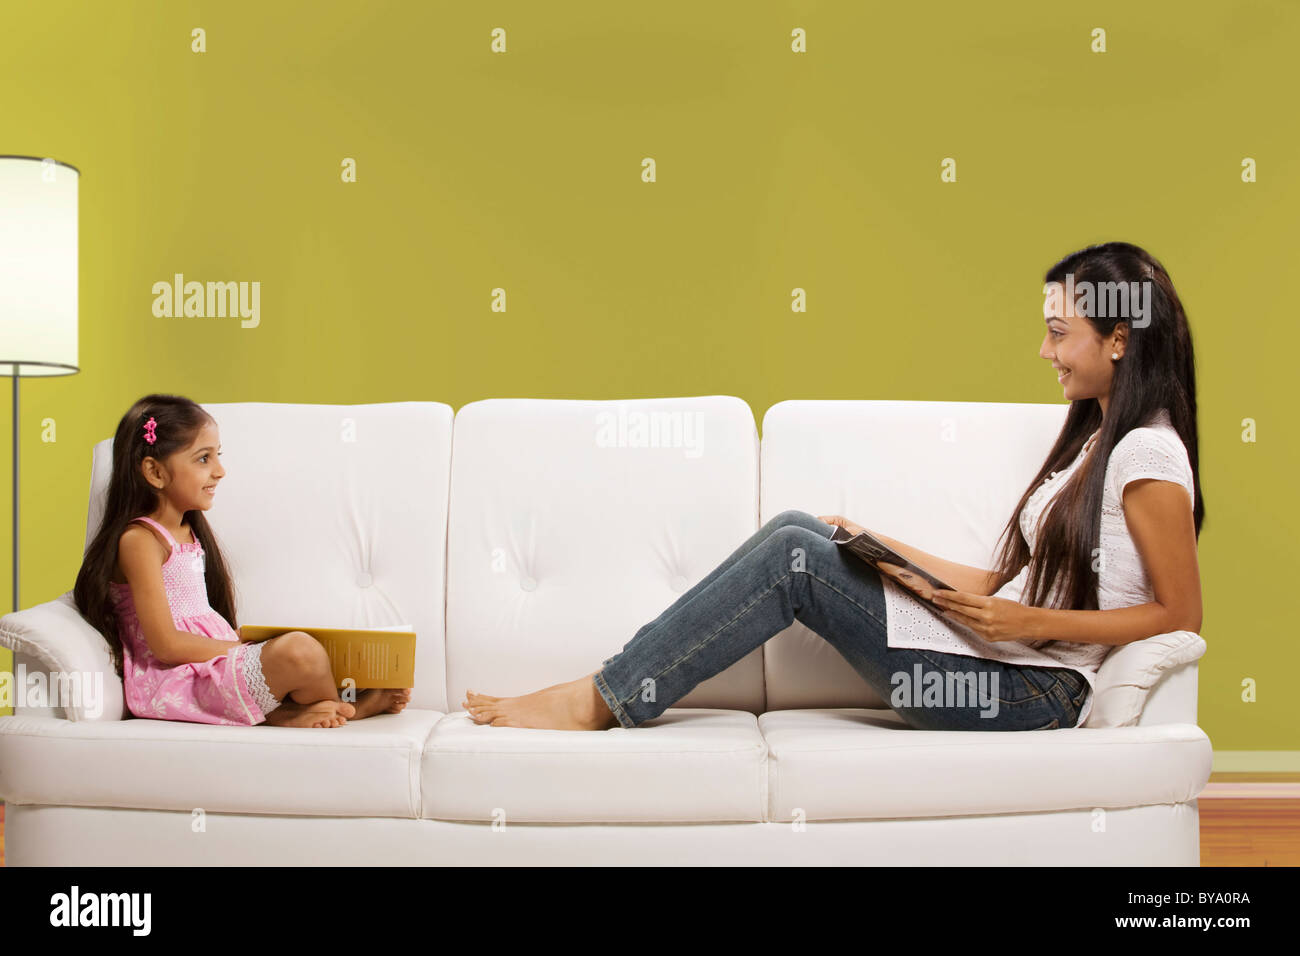 Madre e hija sentado en un sofá Imagen De Stock